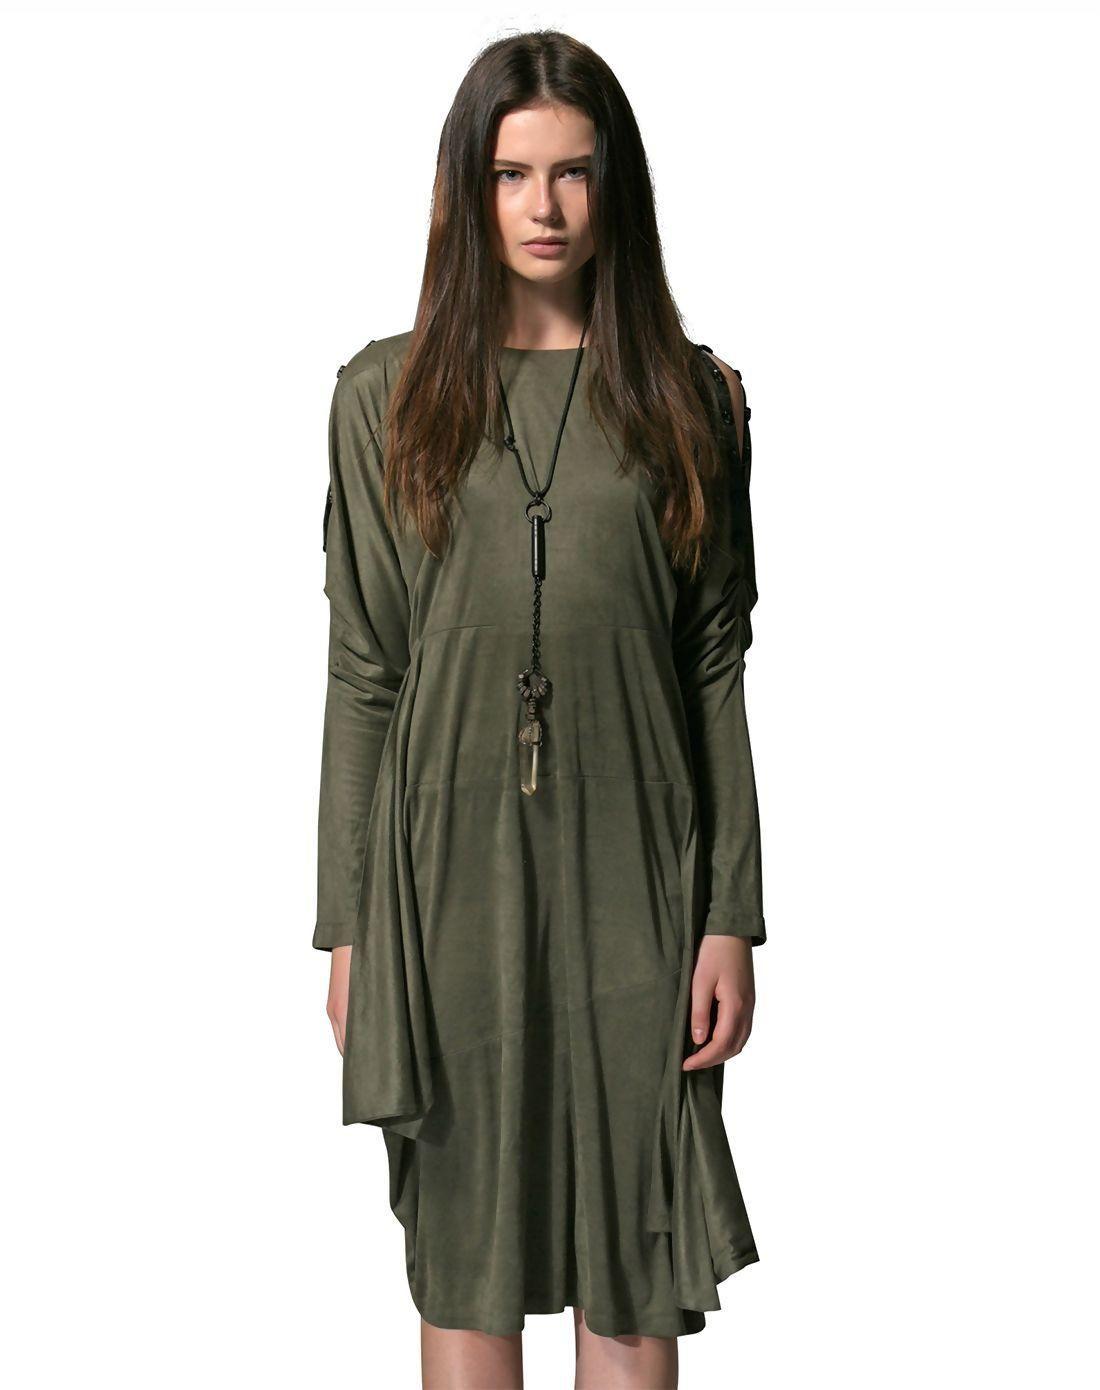 Long dark green dress  AdoreWe VIPme VIPSHOP Global PUNK RAVE Dark Green Cold Shoulder